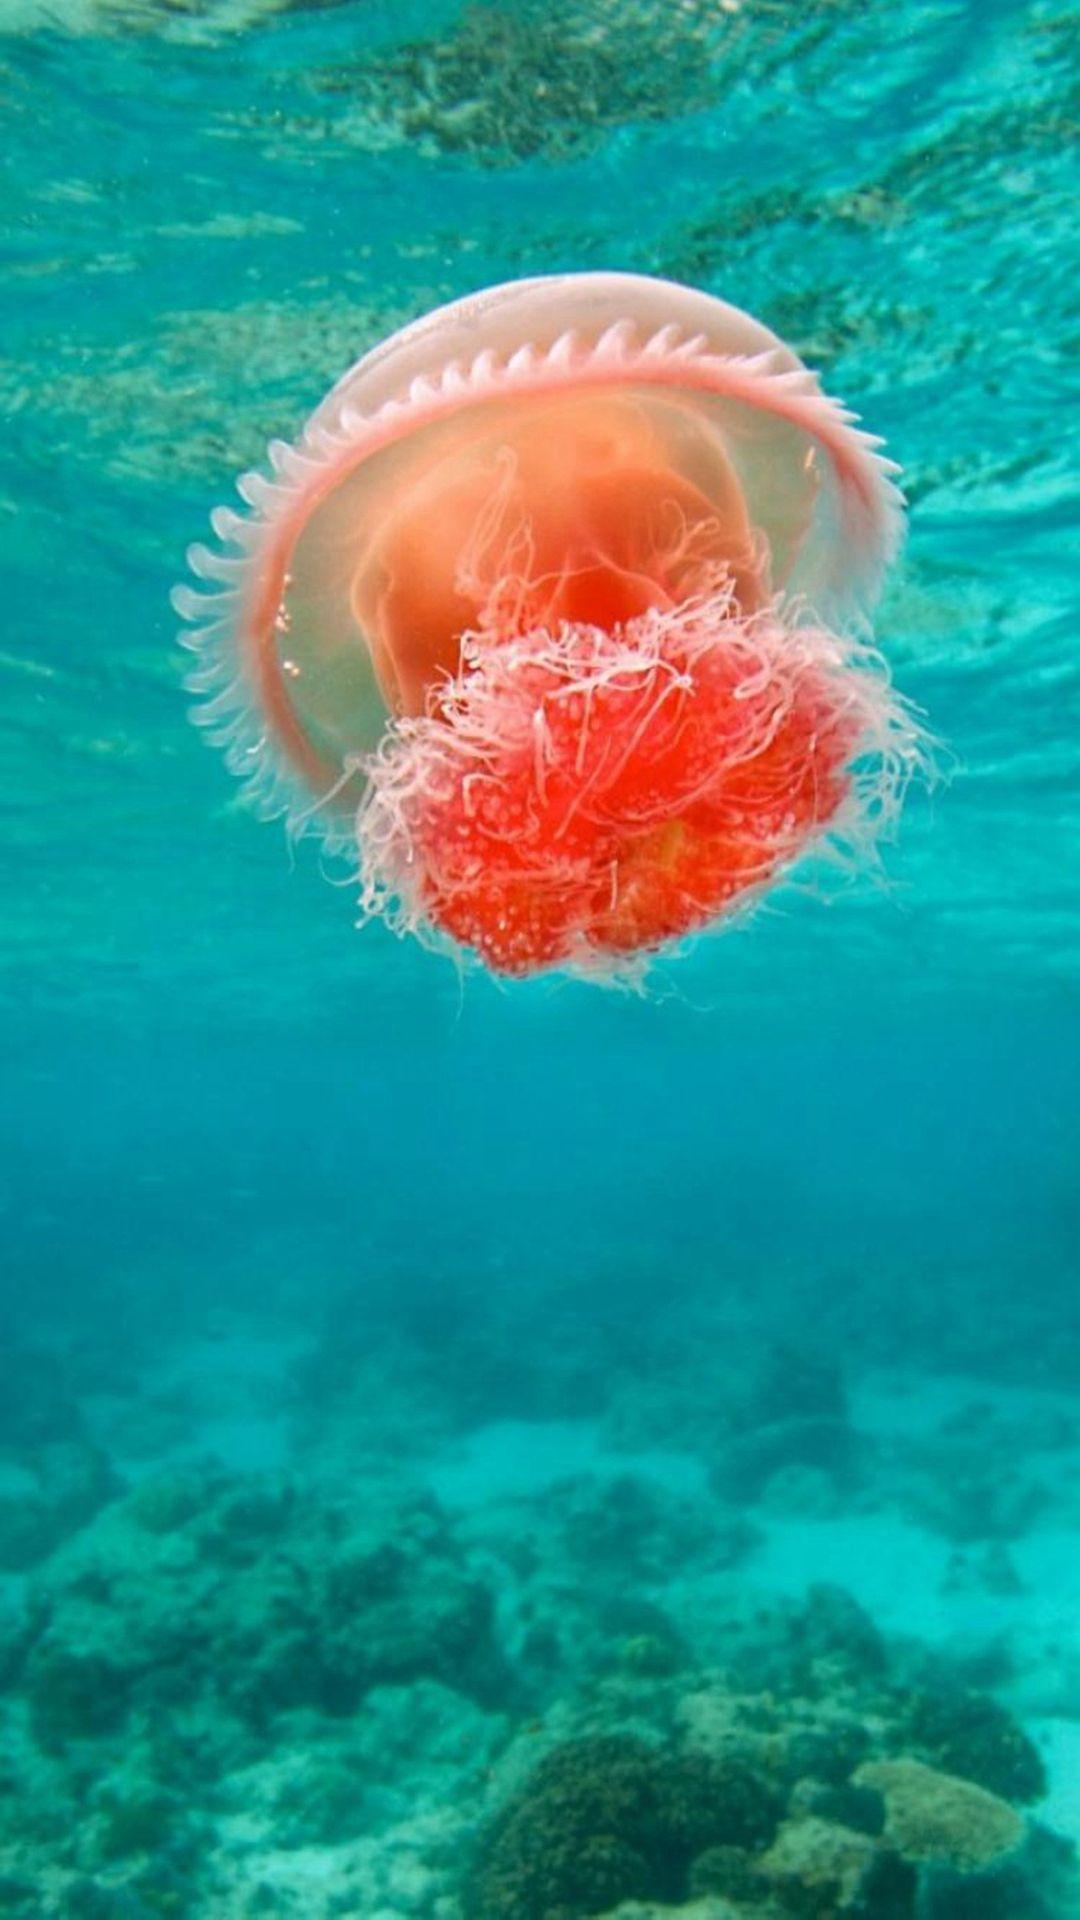 Jellyfish iphone wallpaper tumblr - Wonderful Undersea Ocean Beautiful Jellyfish Iphone 6 Plus Wallpaper